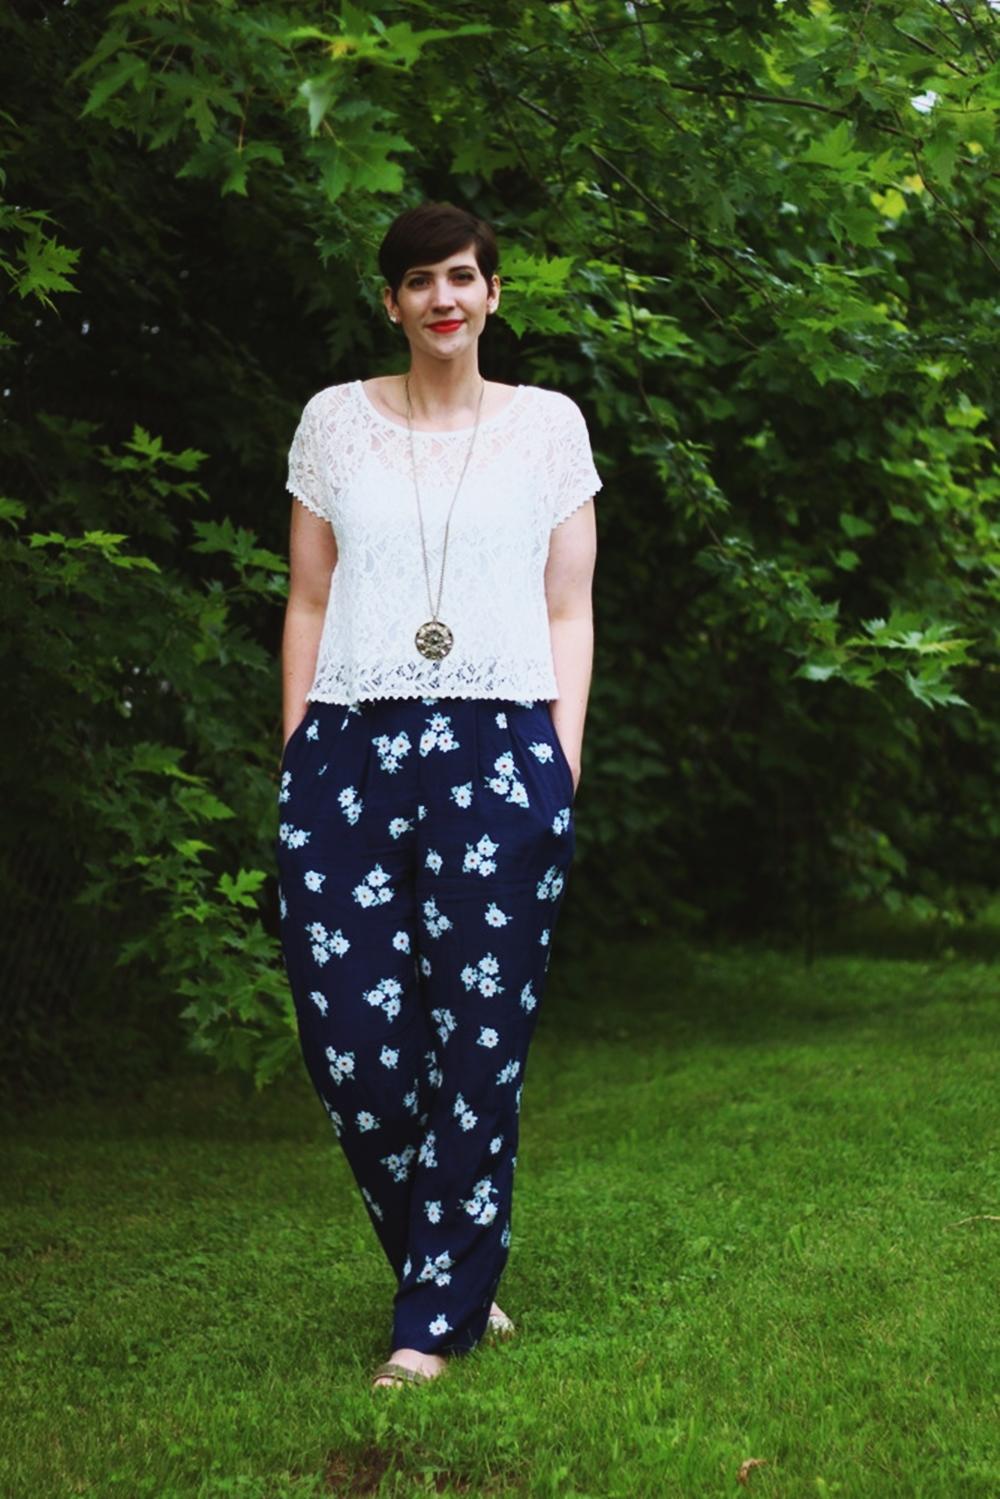 Flourishing Fashionista | Outfit